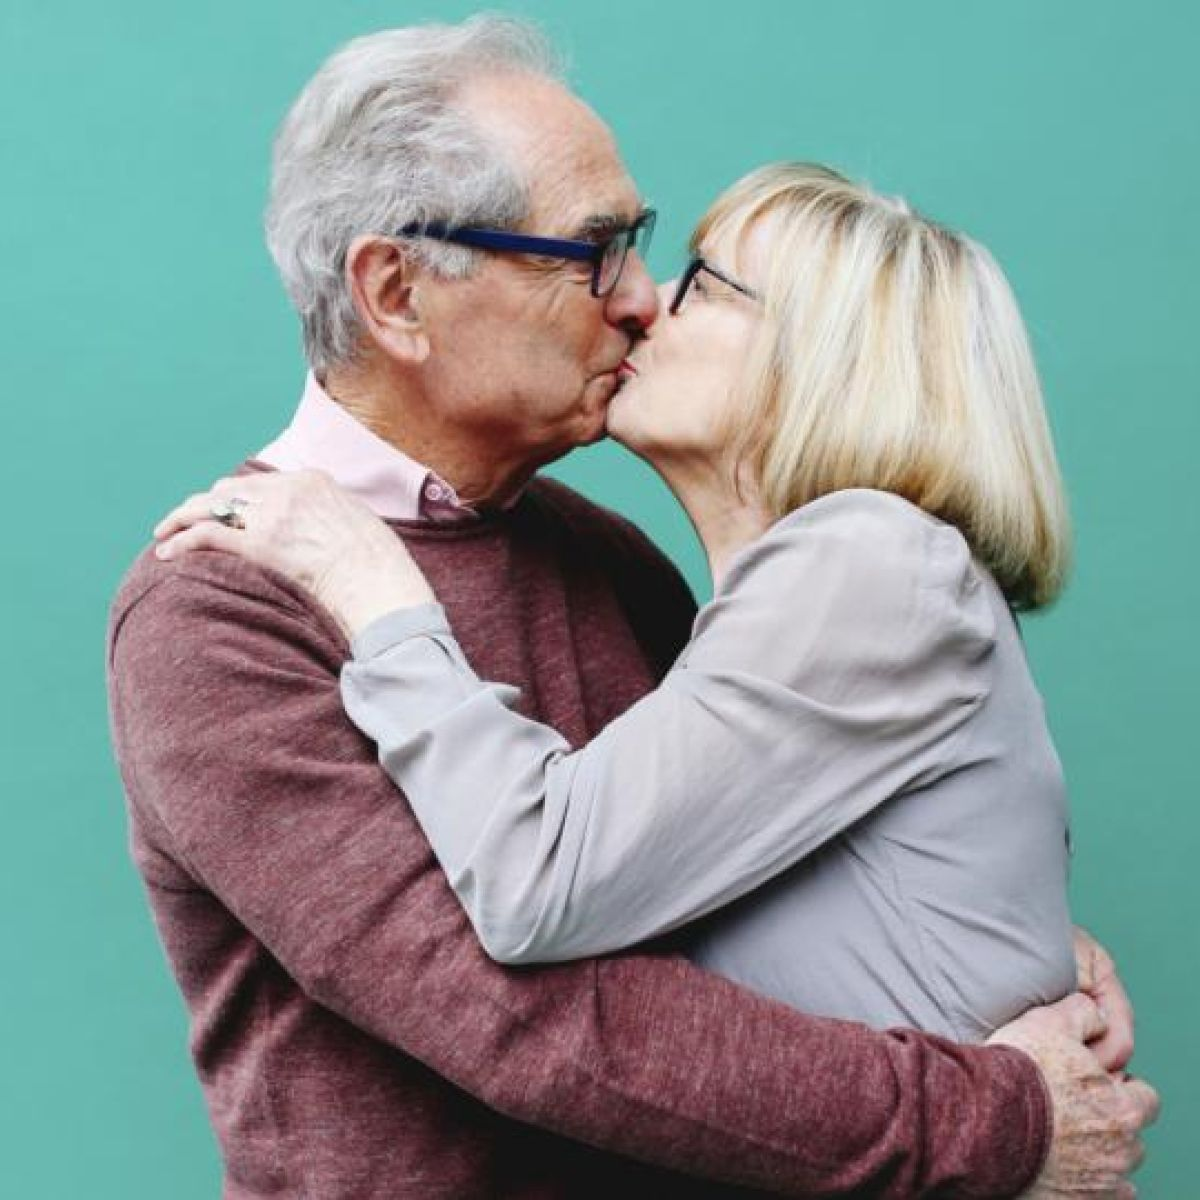 Kissing old men 5 Key